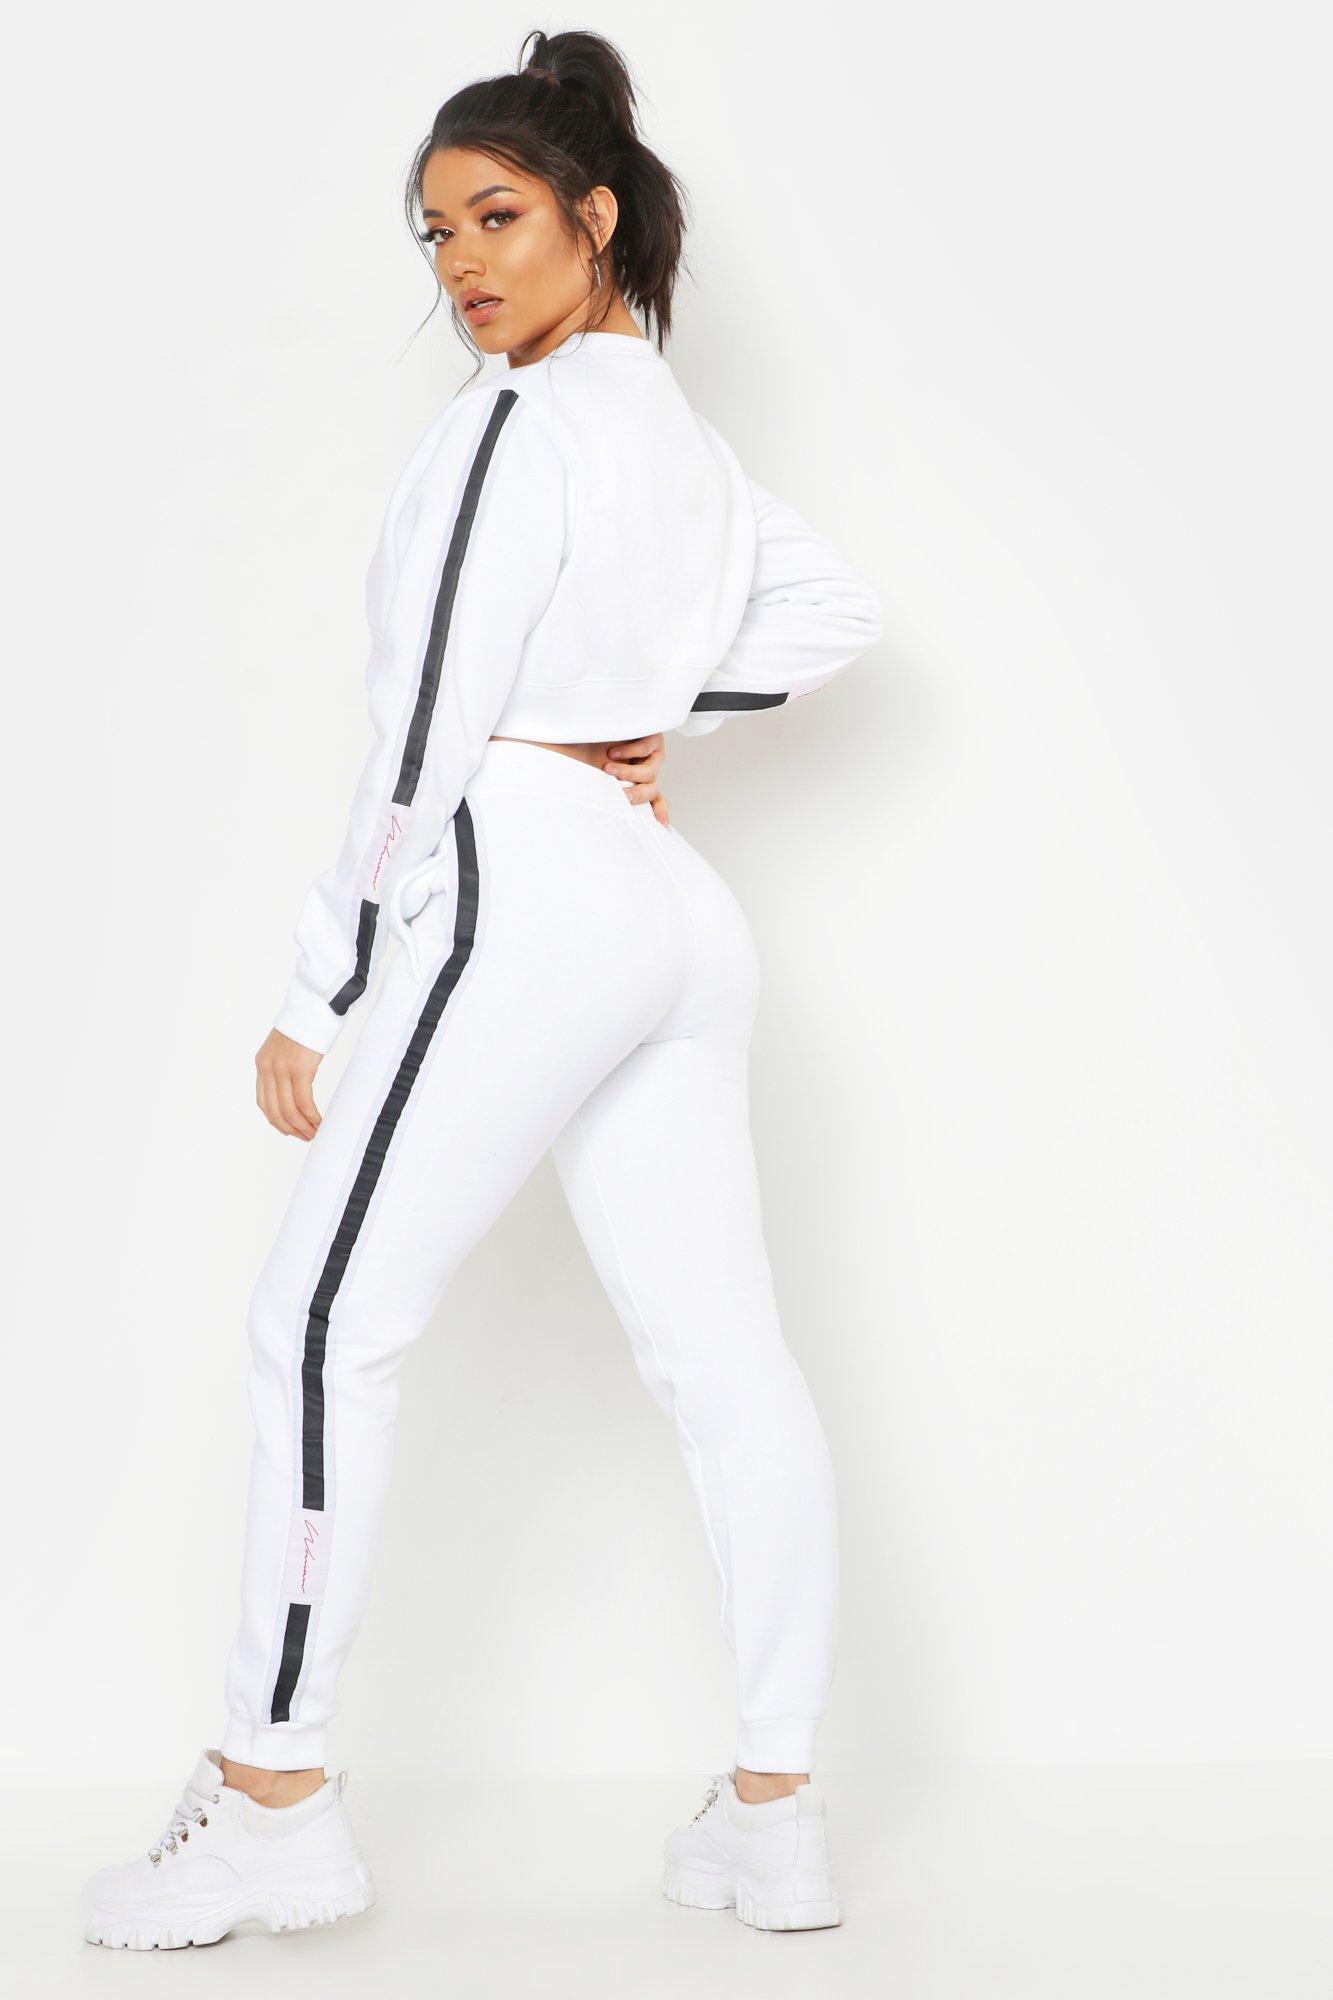 Womens Trainingsanzug aus kurzem Woman-Pullover und Jogginghose - Weiß - 36, Weiß - Boohoo.com